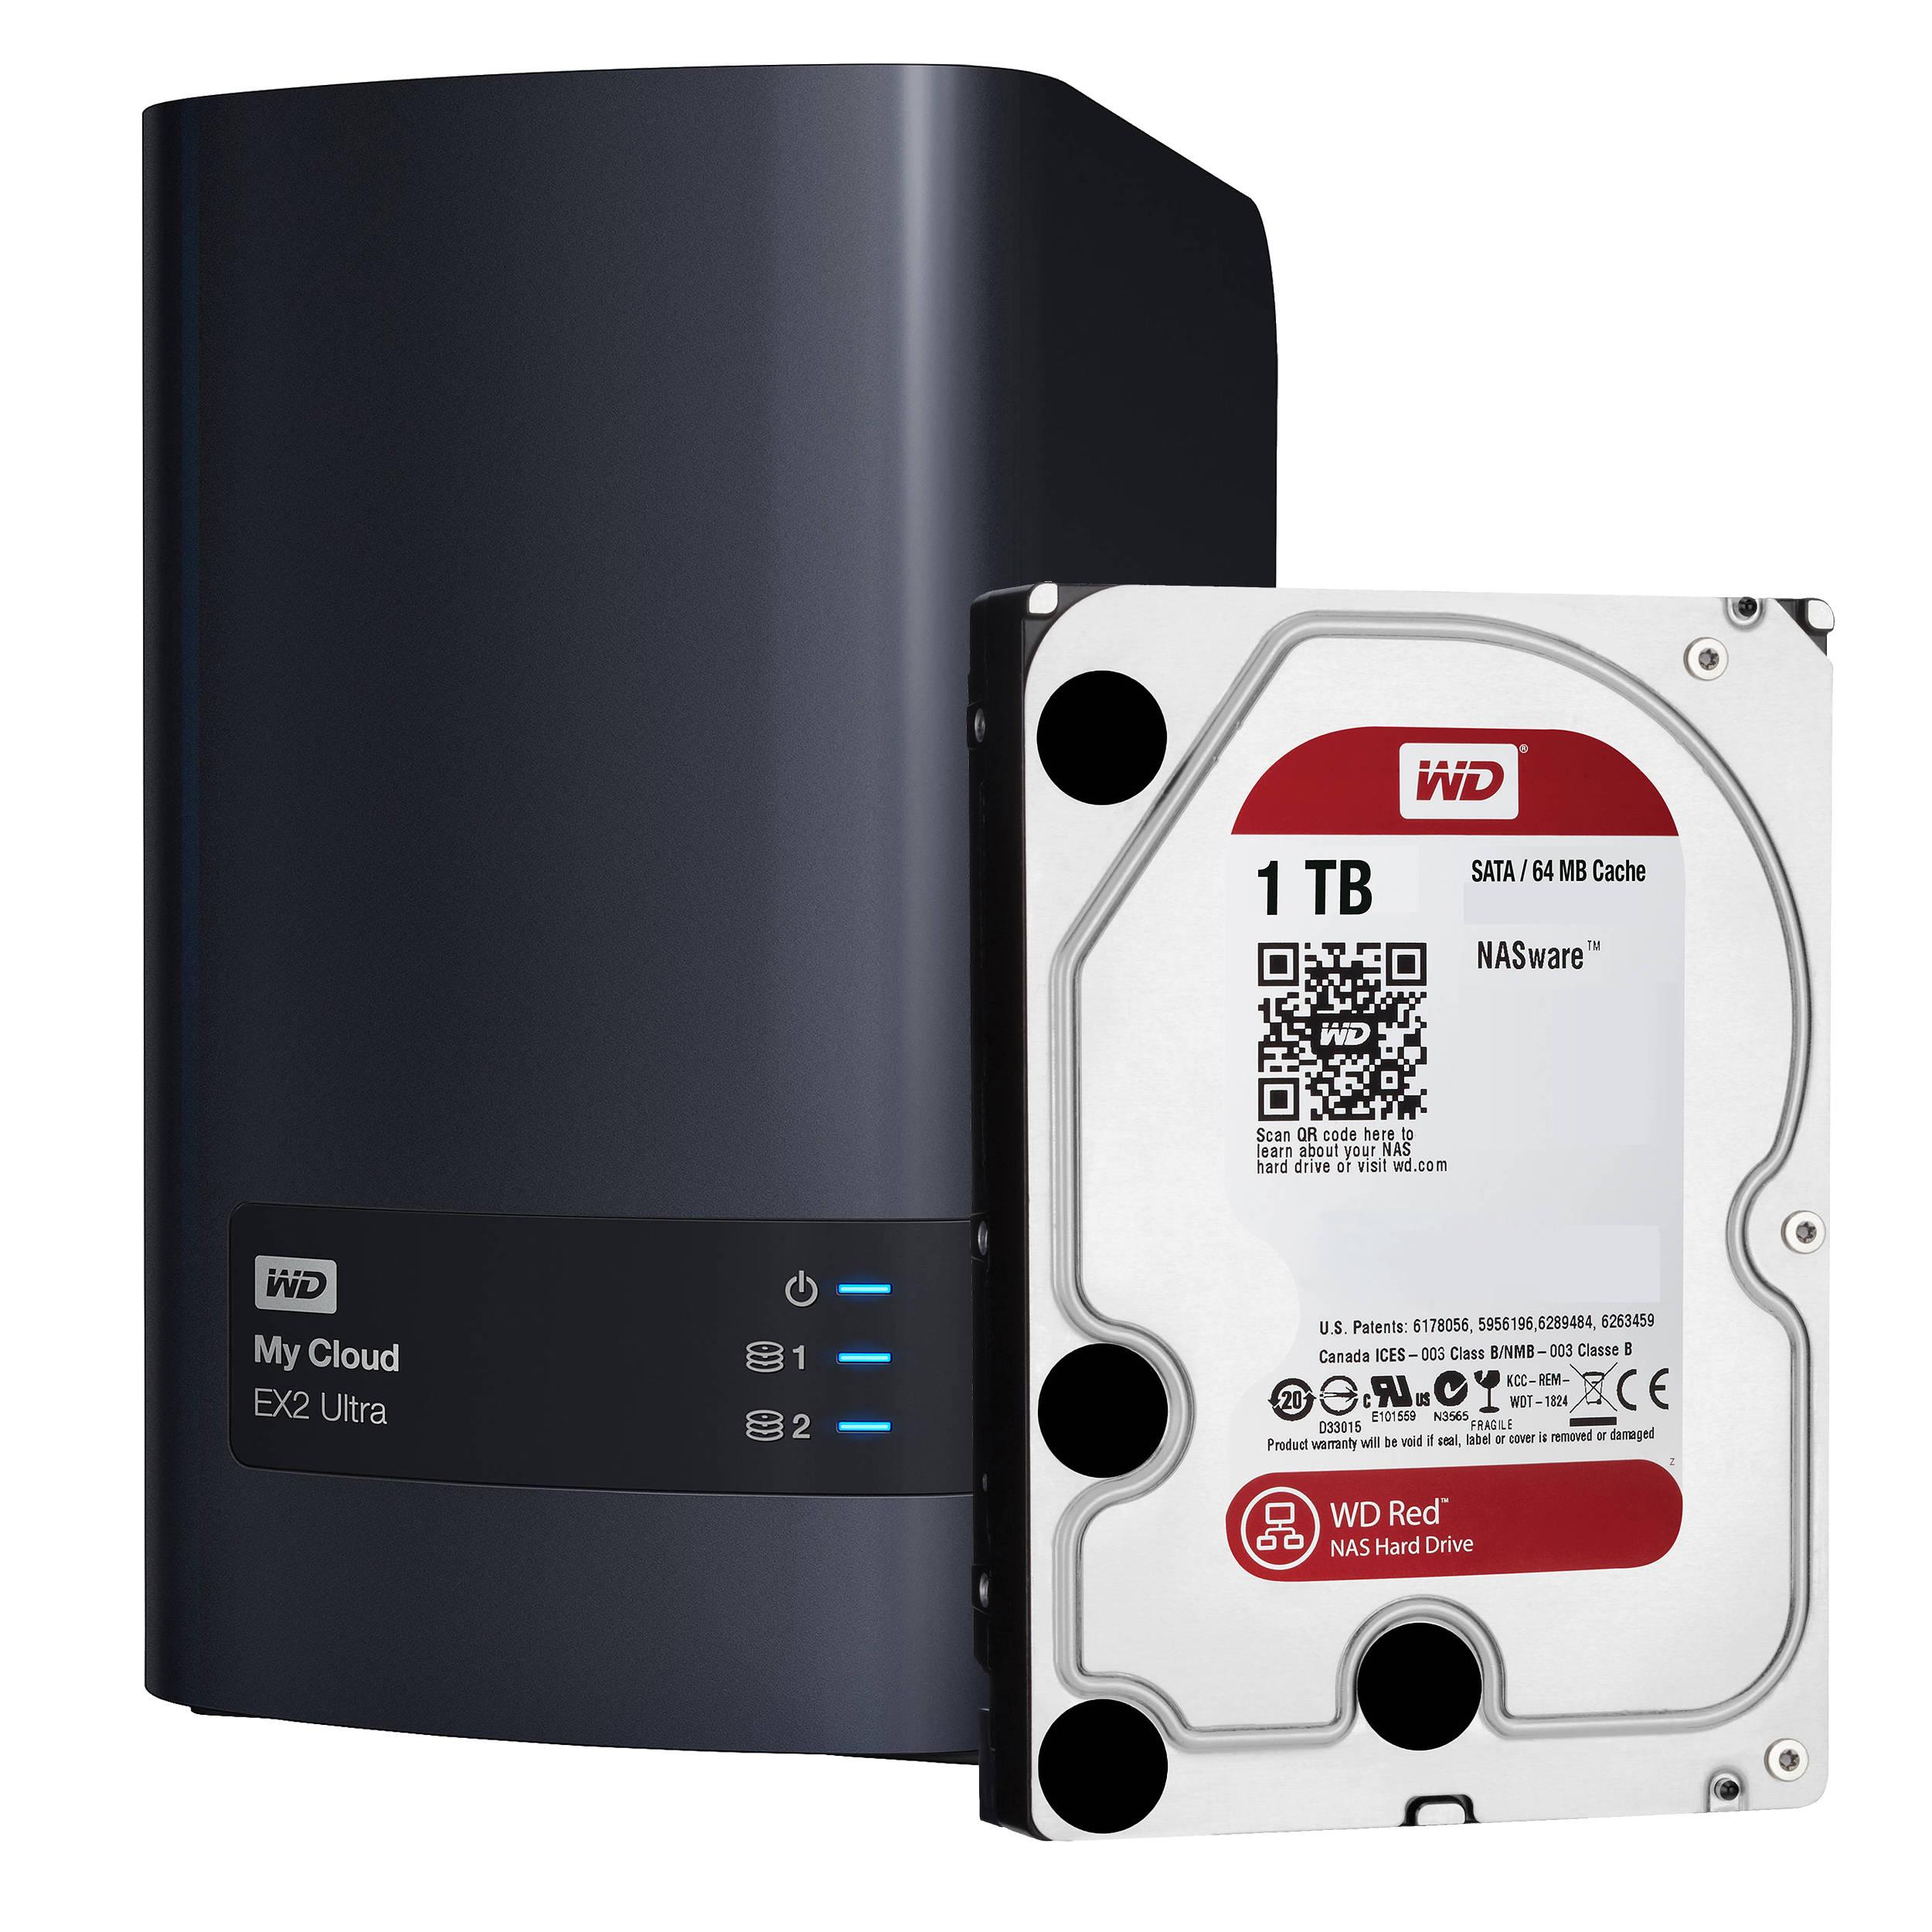 WD My Cloud EX2 Ultra 2TB 2-Bay Personal Storage Server Kit with Drives (2  x 1TB)